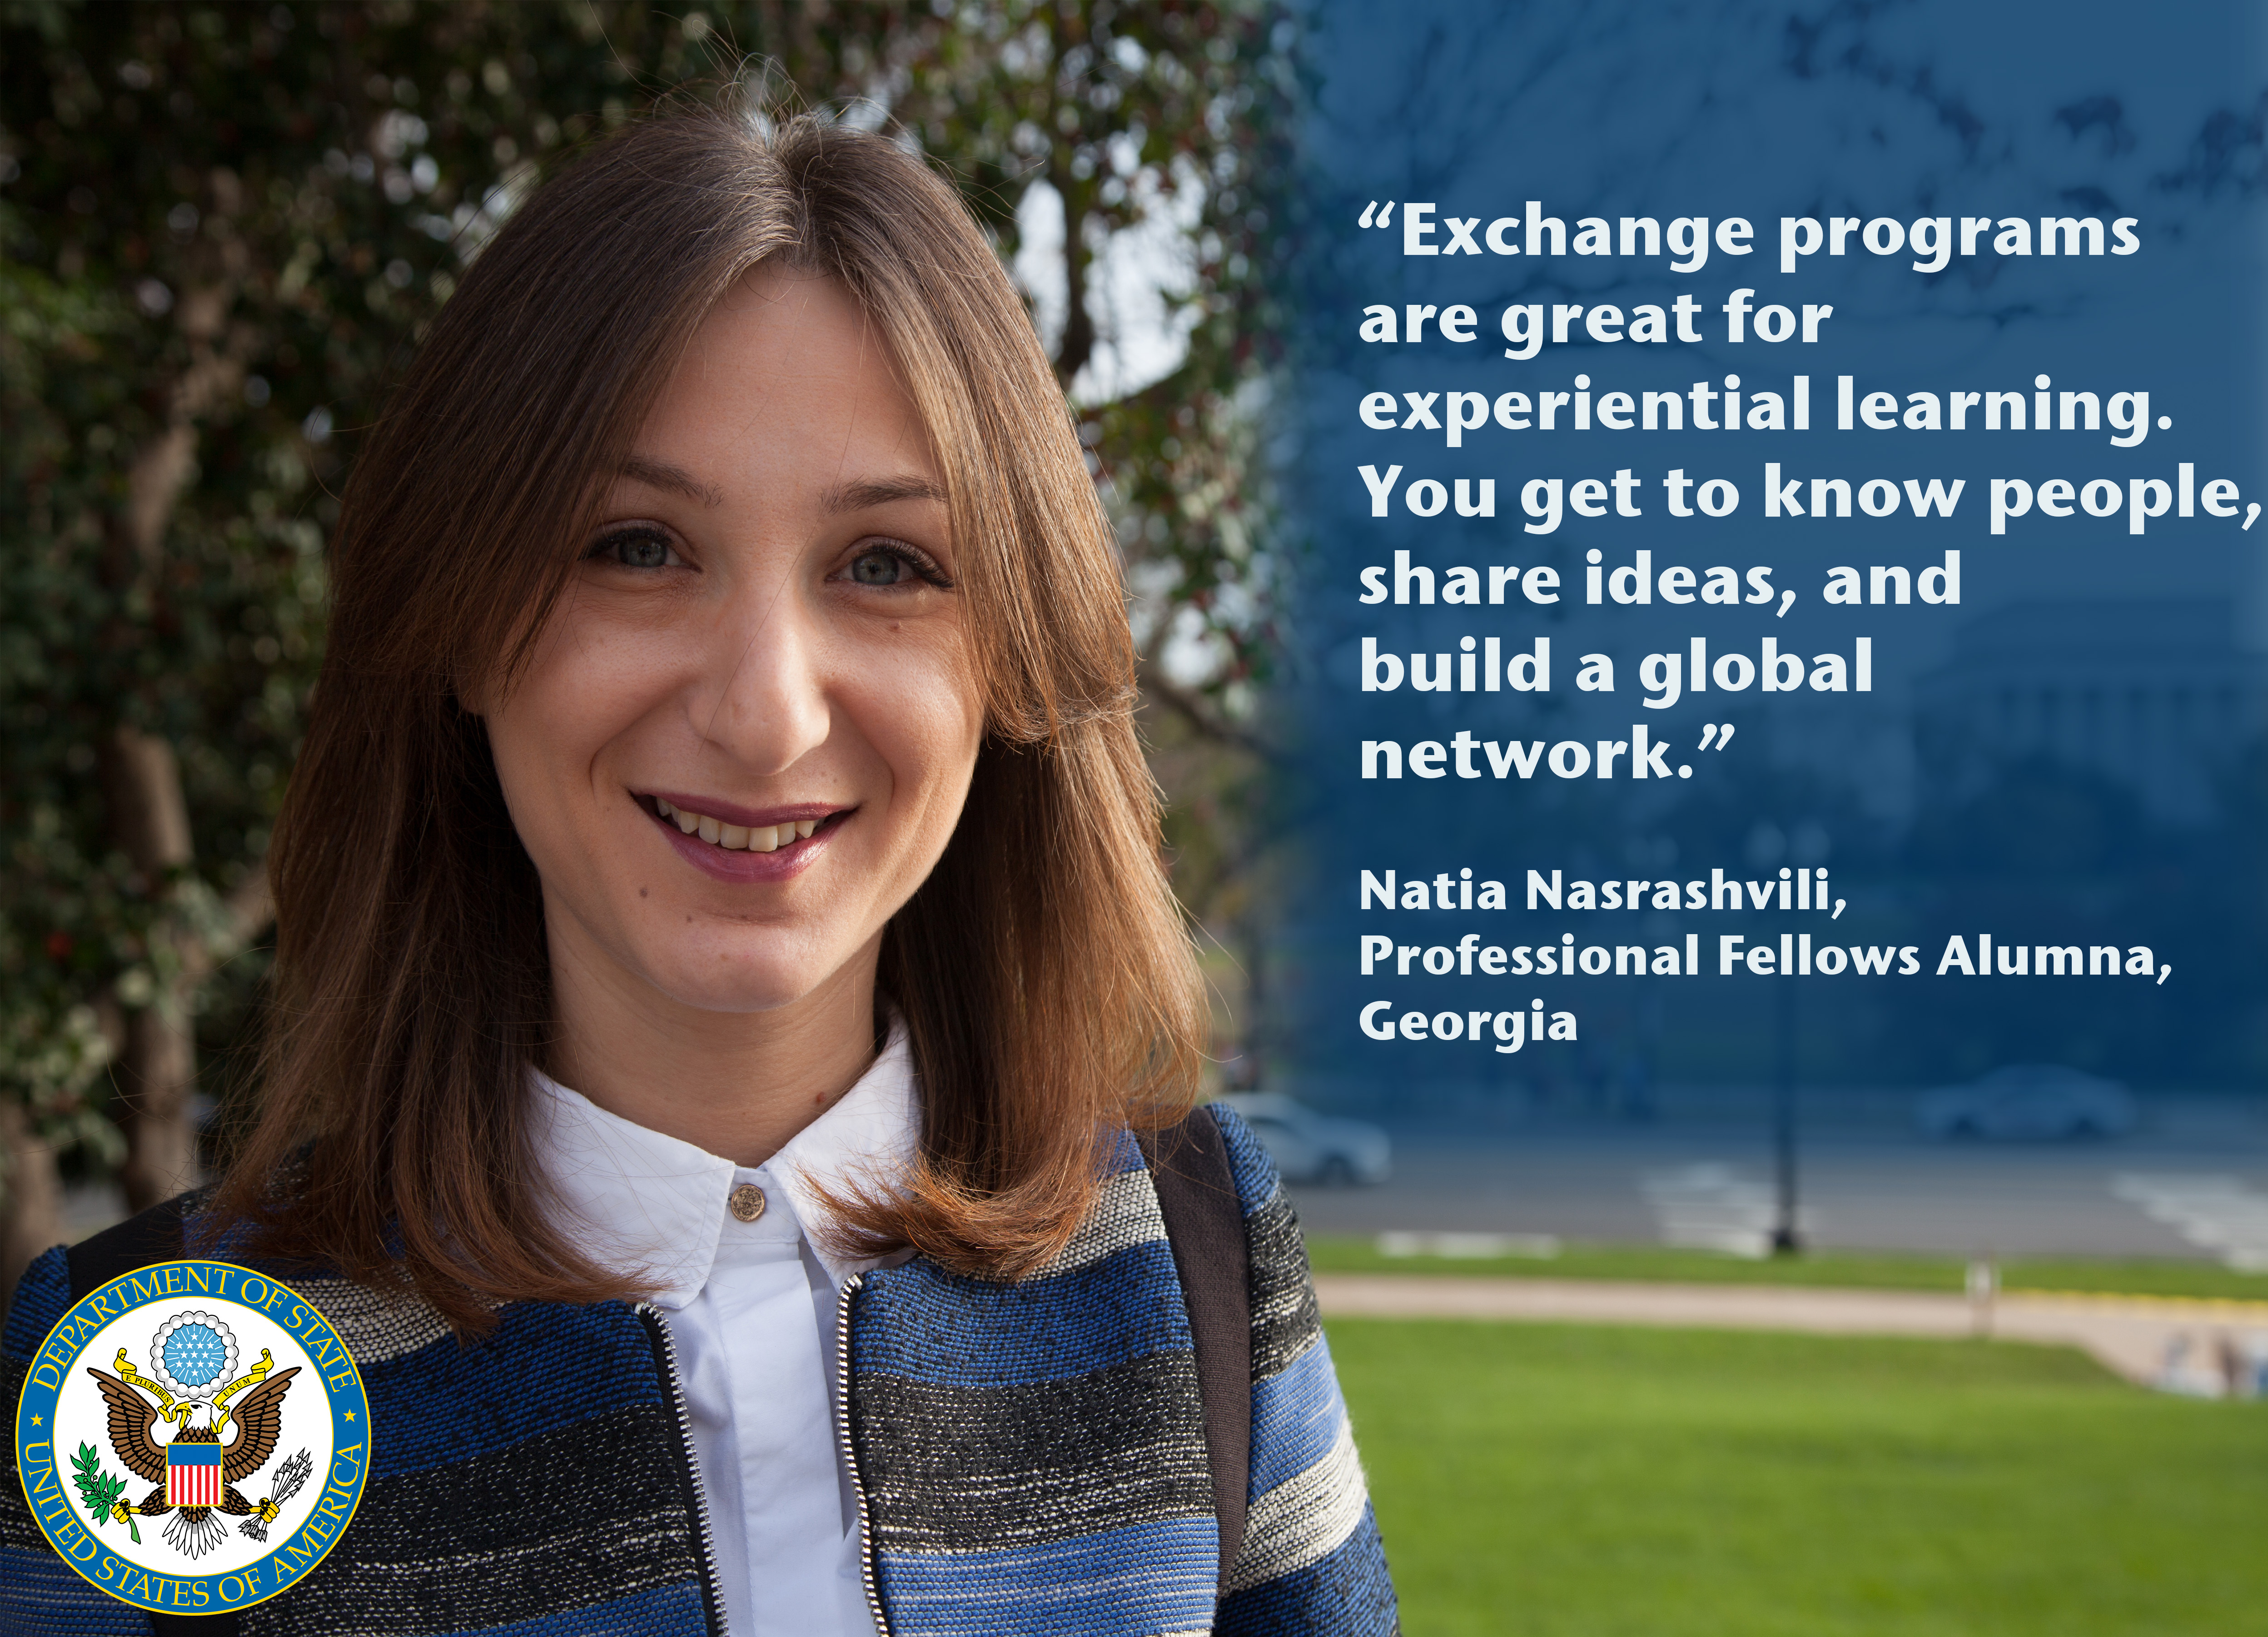 Professional Fellows Alumni Share their exchange experience stories, Alumni, Georgia, Outdoor, People, HQ Photo